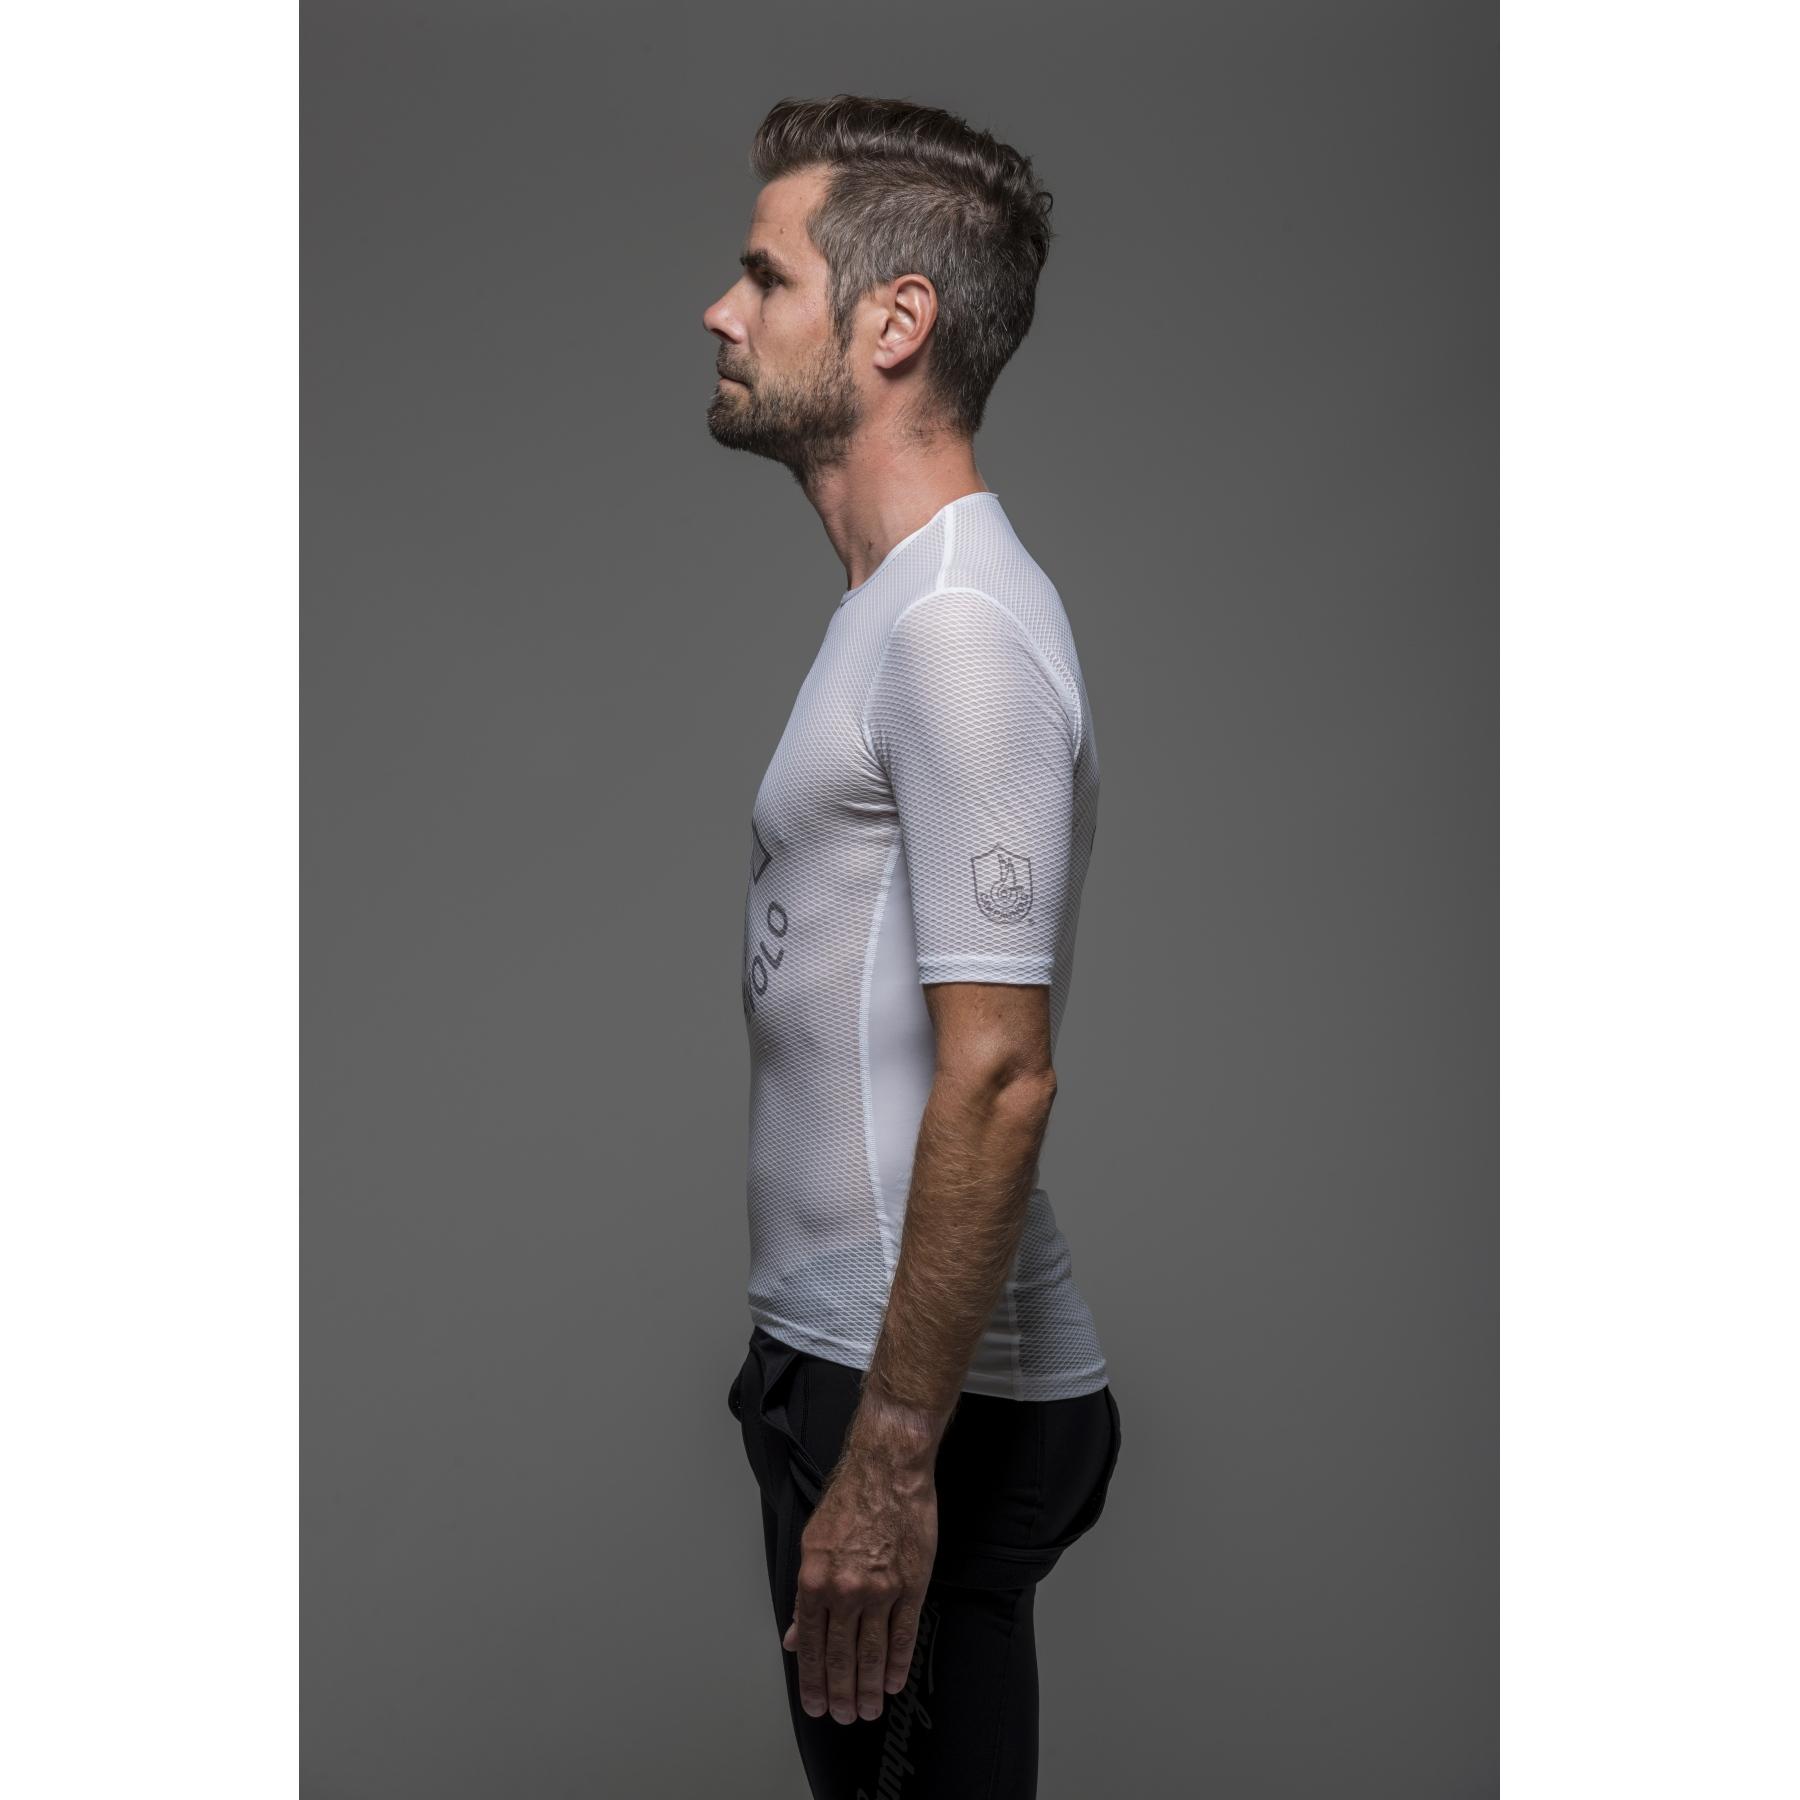 Image of Campagnolo Litech Mesh Base Layer Undershirt - white